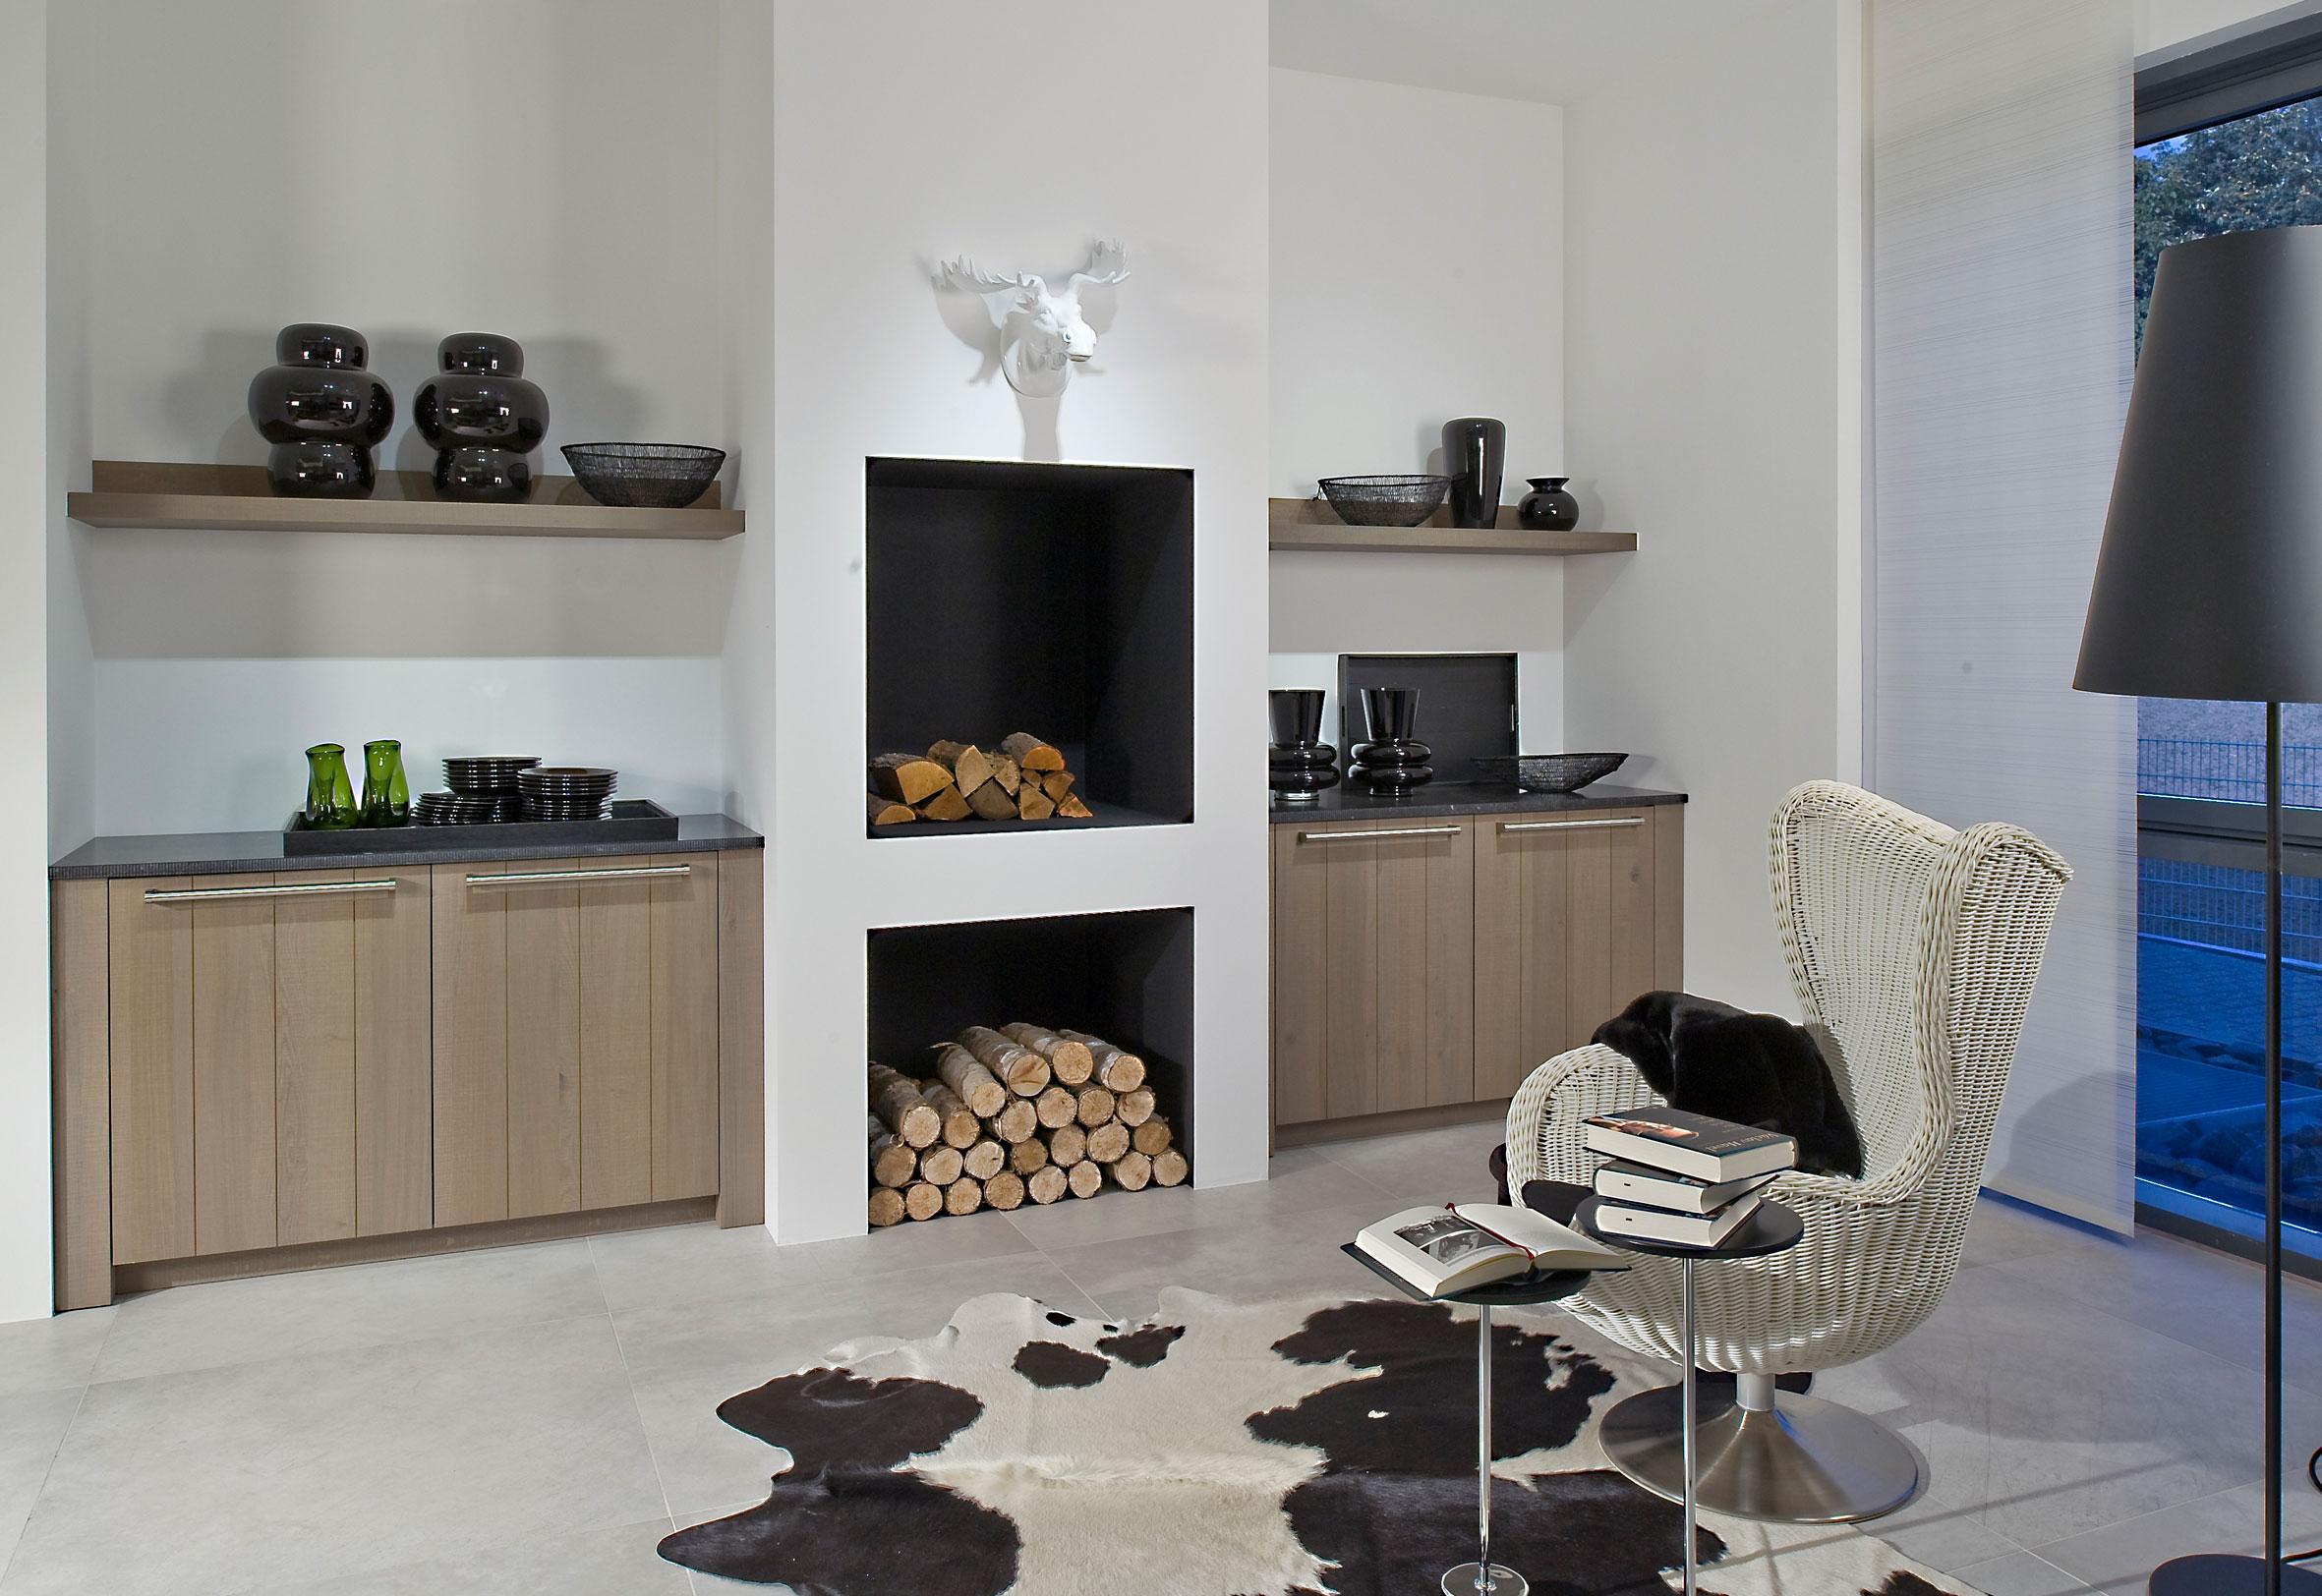 Piet Boon Keuken Showroom : piet boon keuken friesland keuken in piet boon riverdale stijl